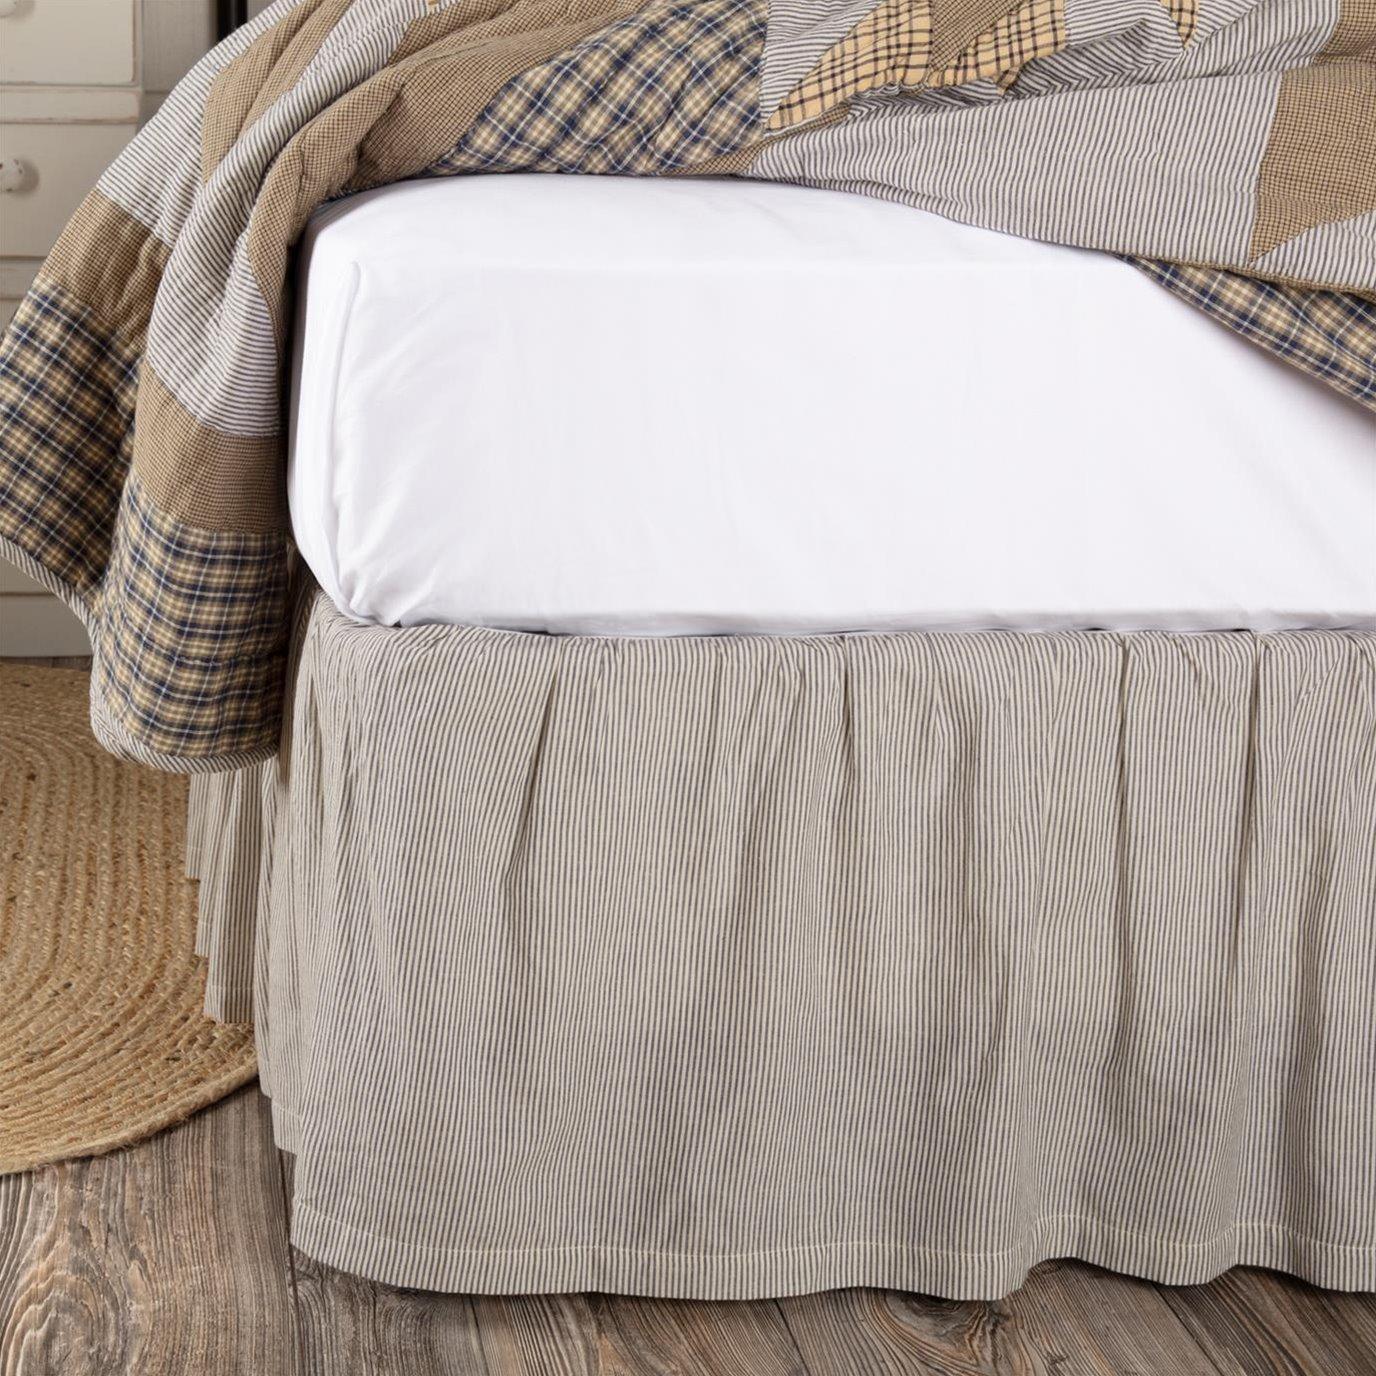 Dakota Star Farmhouse Blue Ticking Stripe Queen Bed Skirt 60x80x16